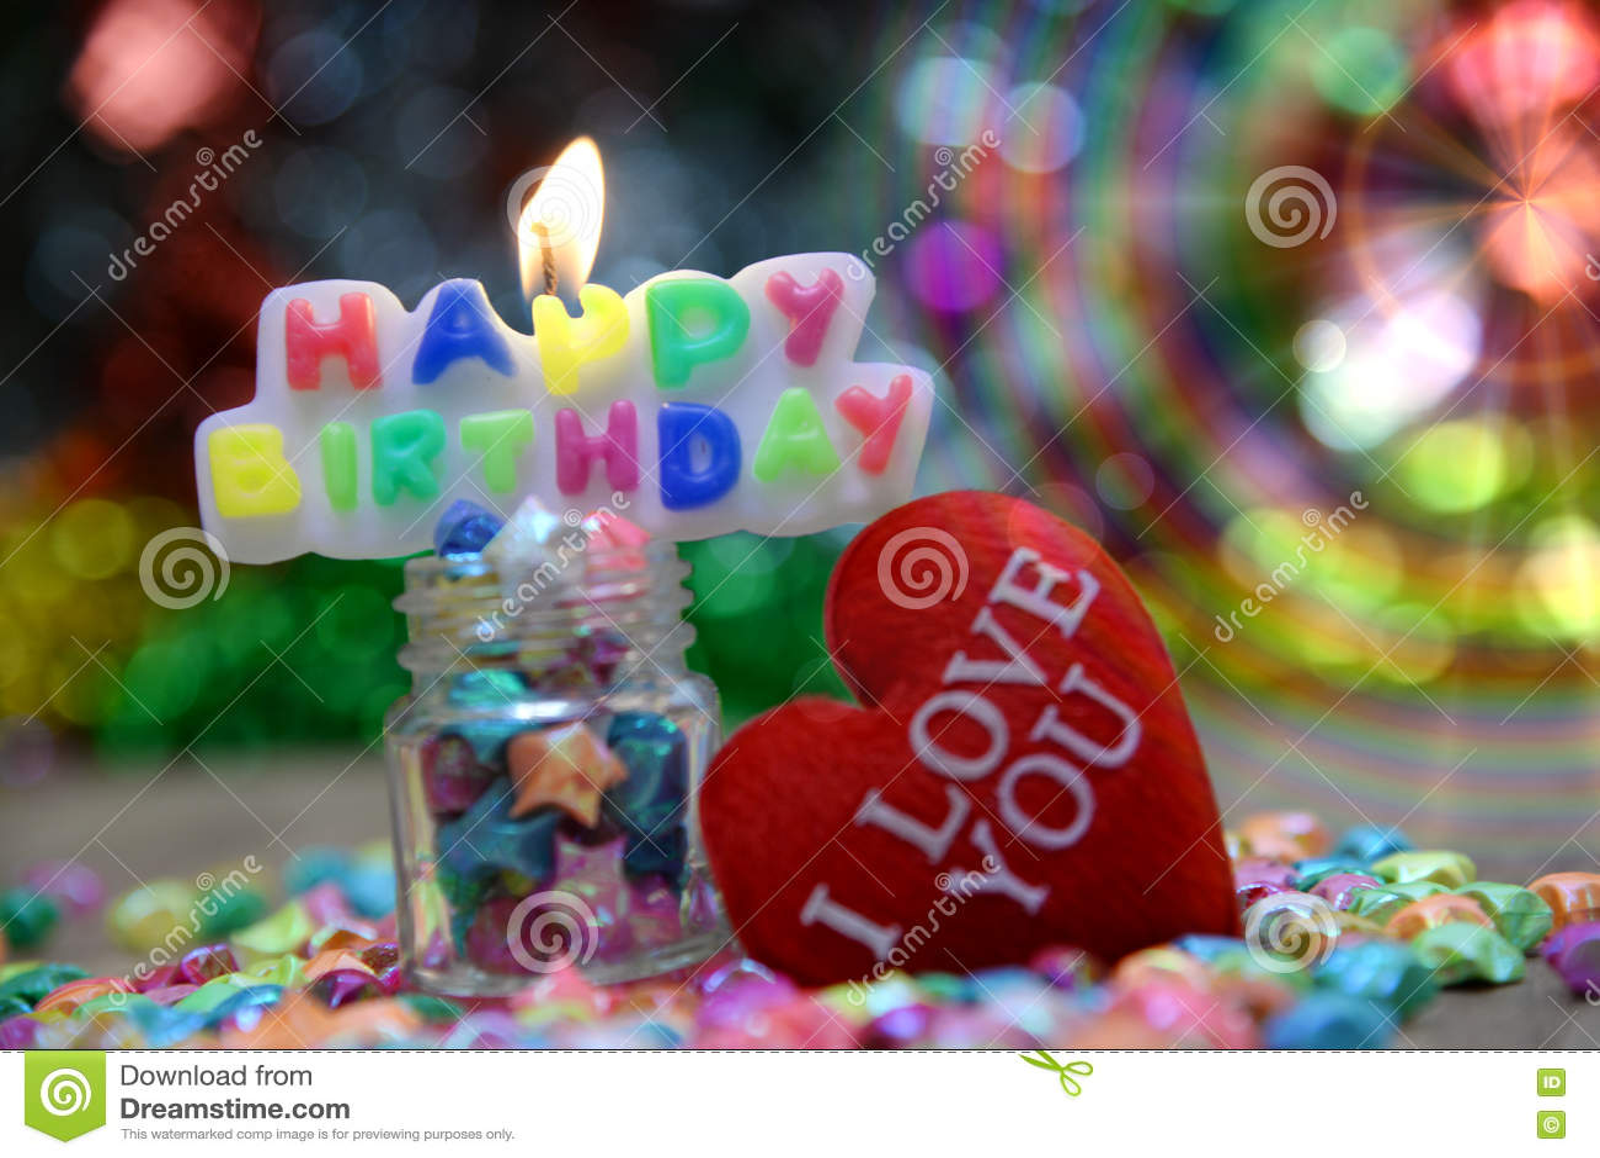 Vista Bonita Feliz Aniversario Imagem De Stock Imagem De